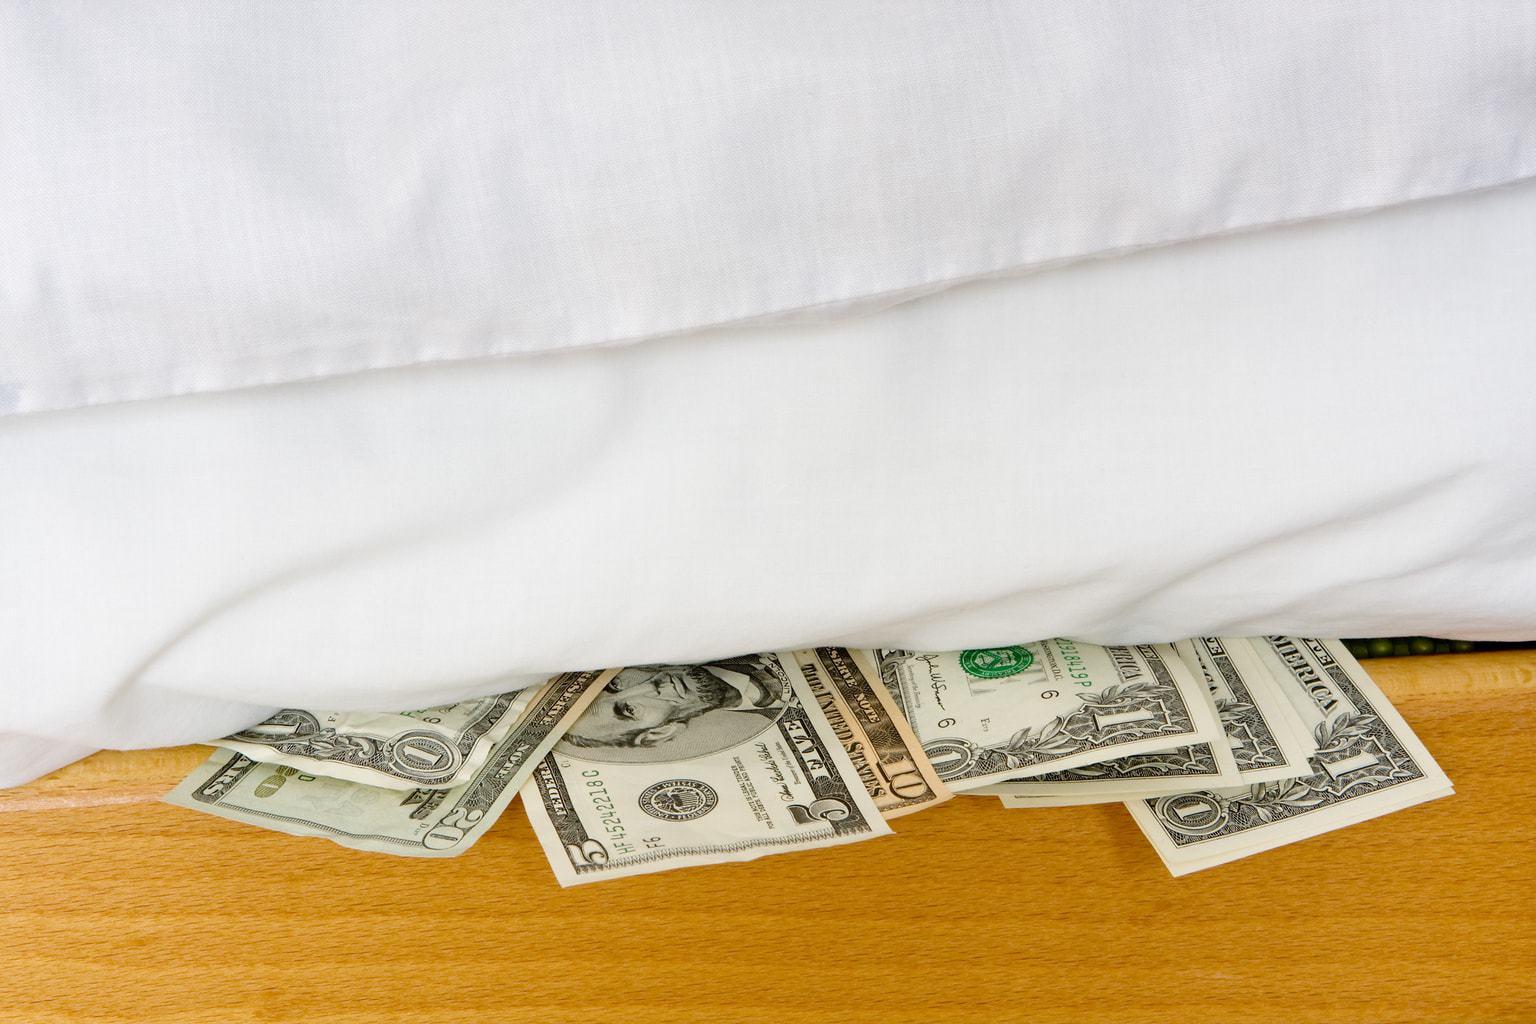 Money hidden under a white mattress